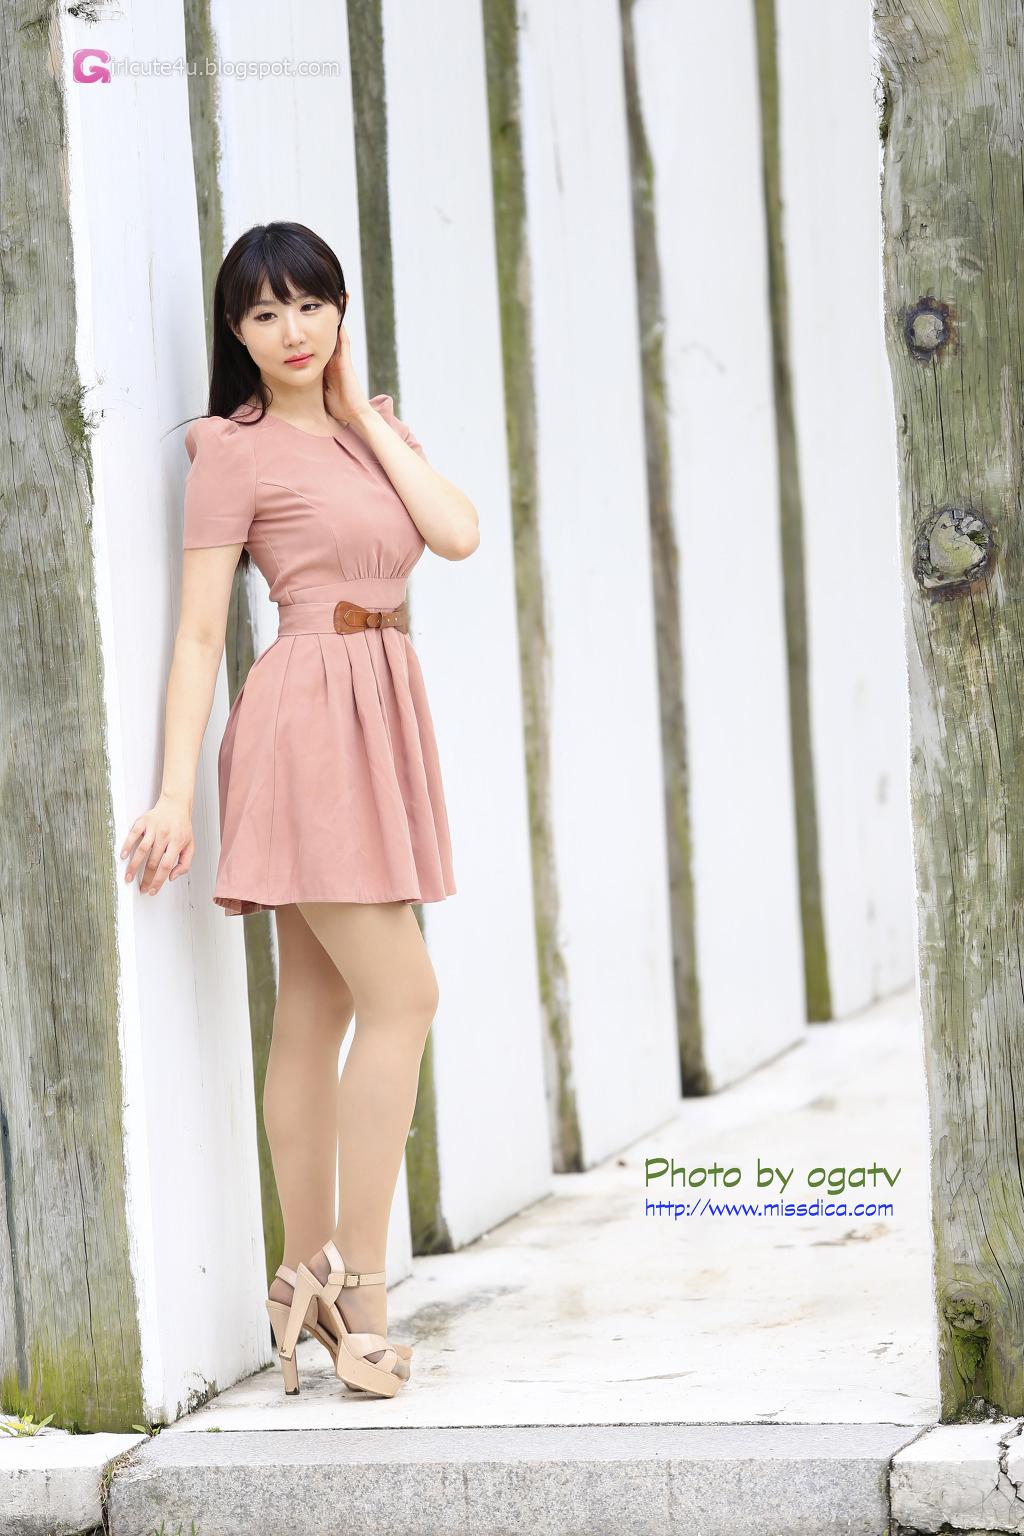 Yeon Da Bin In Beige Dress  Sexy Girls, Nude Girls, Sexy -3445